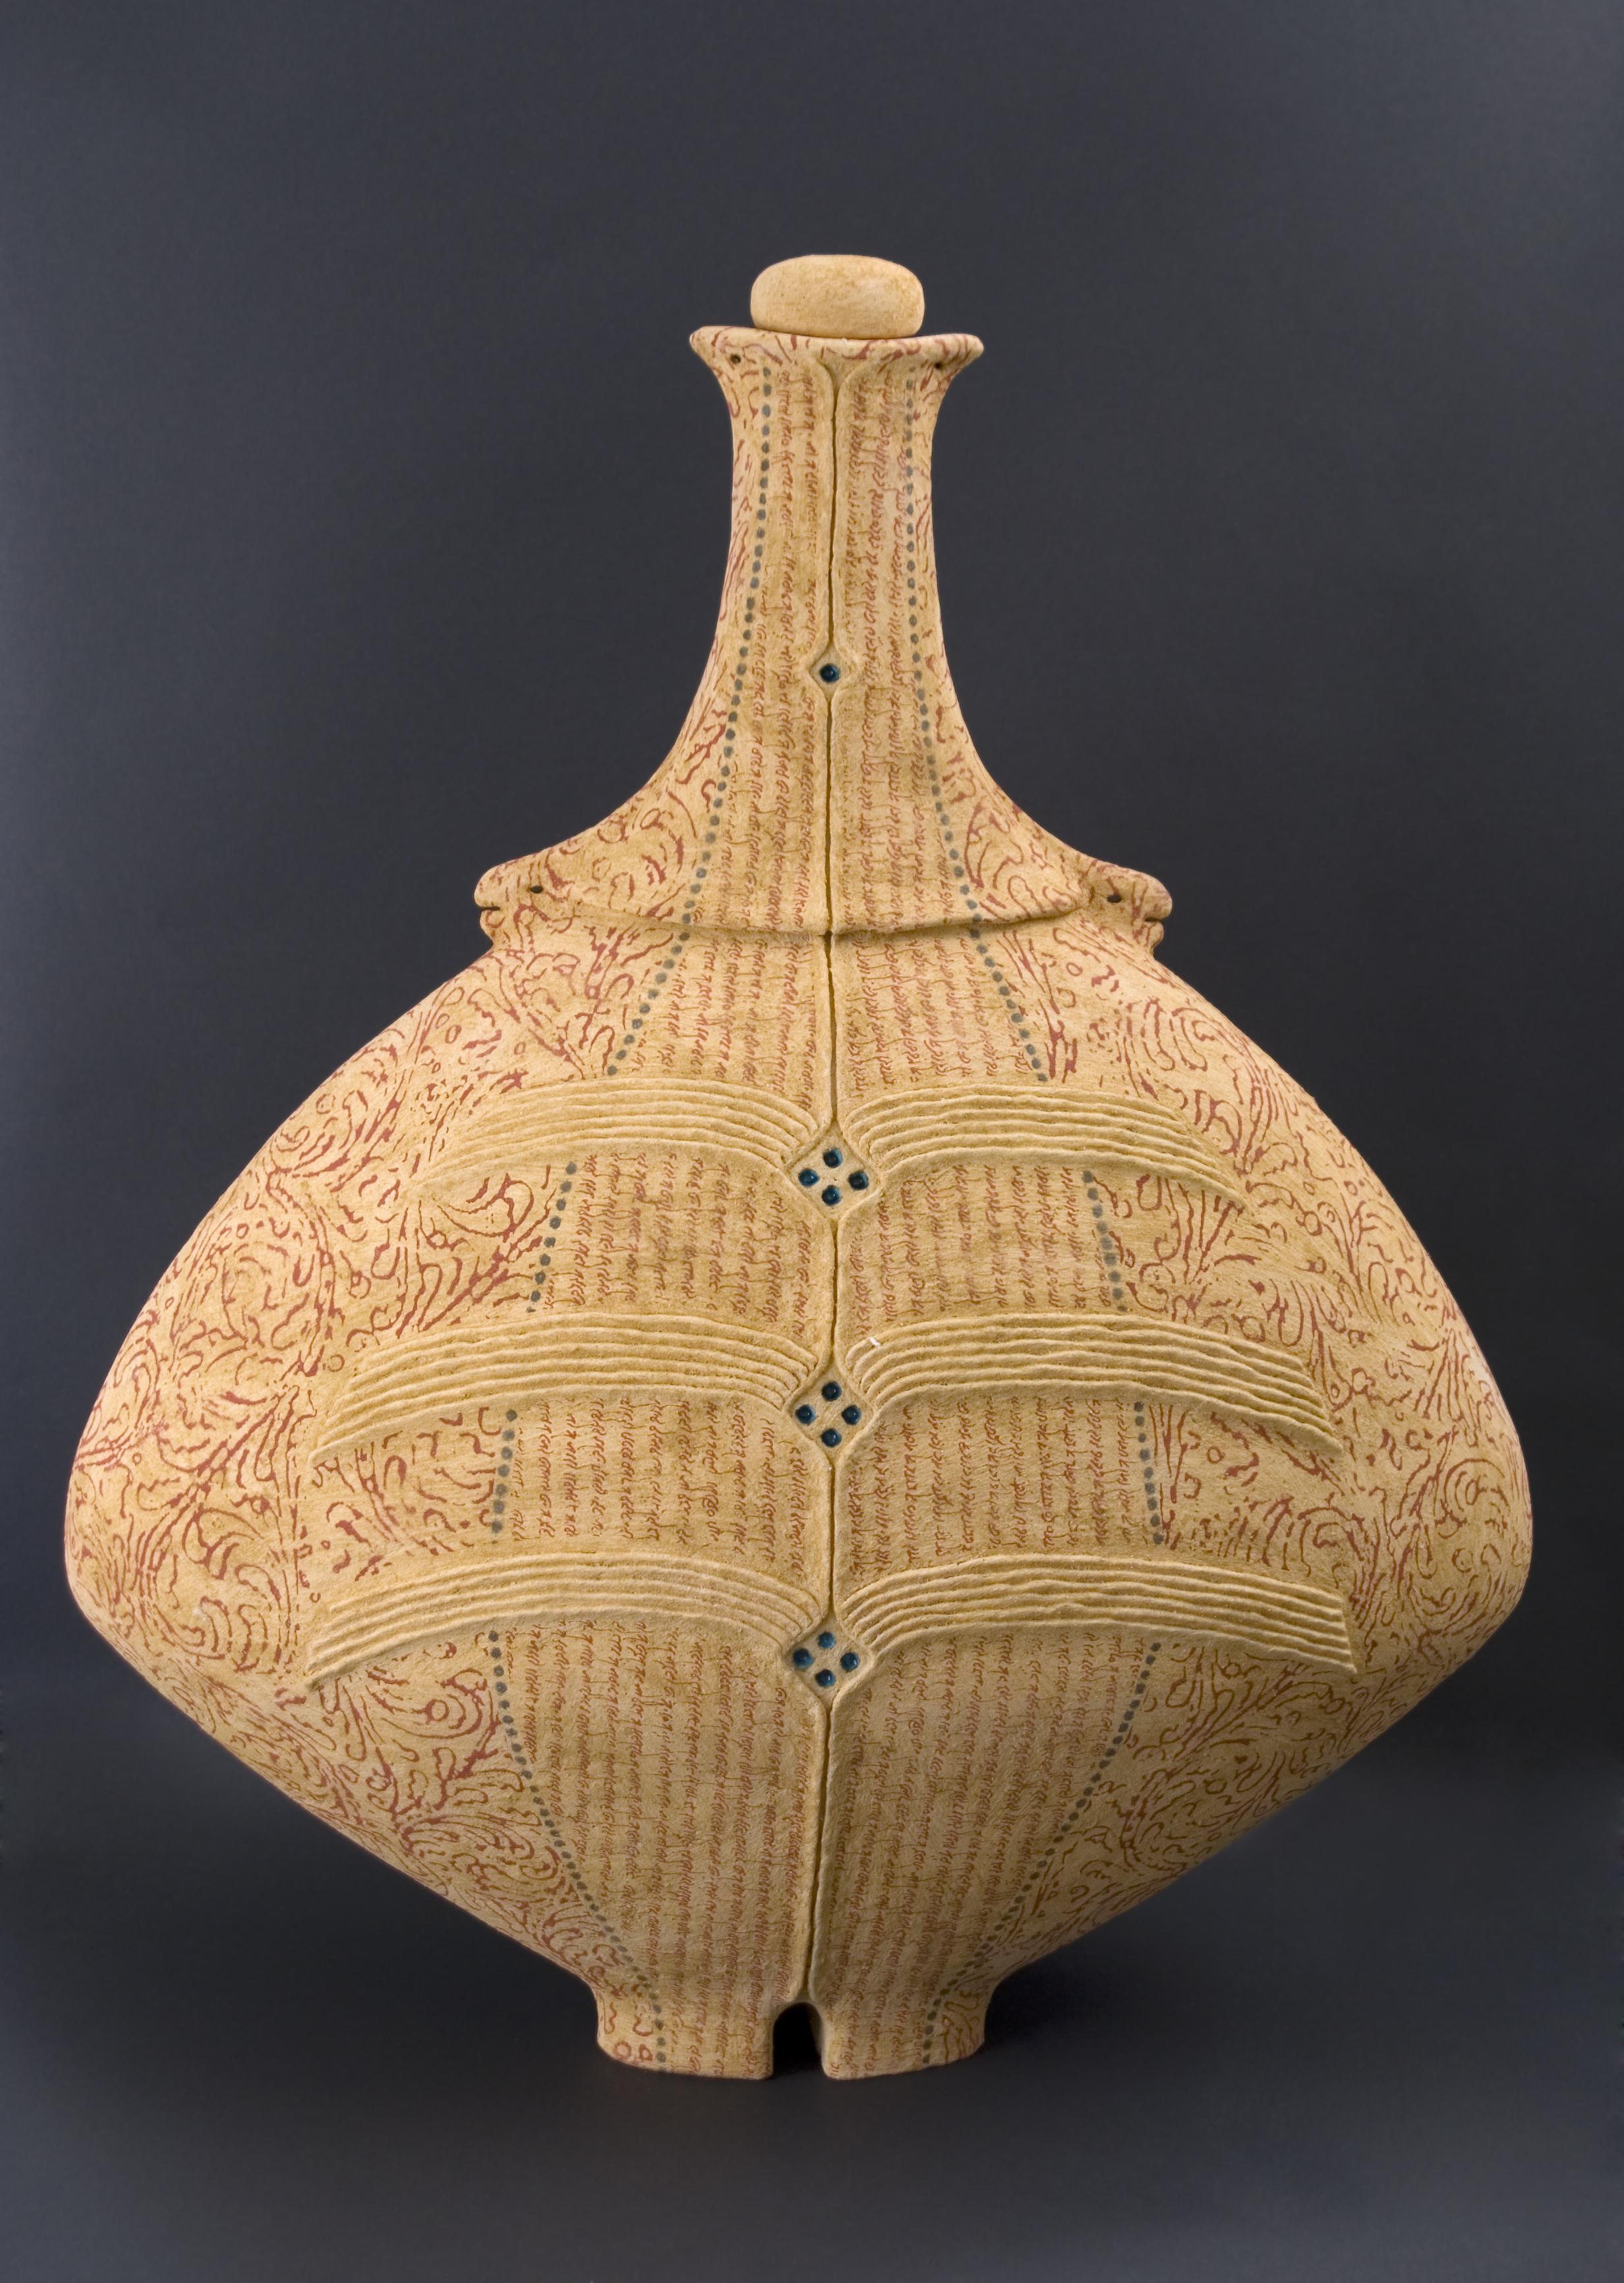 Avital Sheffer    Adamah IV  , 2010 Handbuilt earthenware 26.77 x 21.65 x 10.63 inches / 68 x 55 x 27 cm / ASh 1